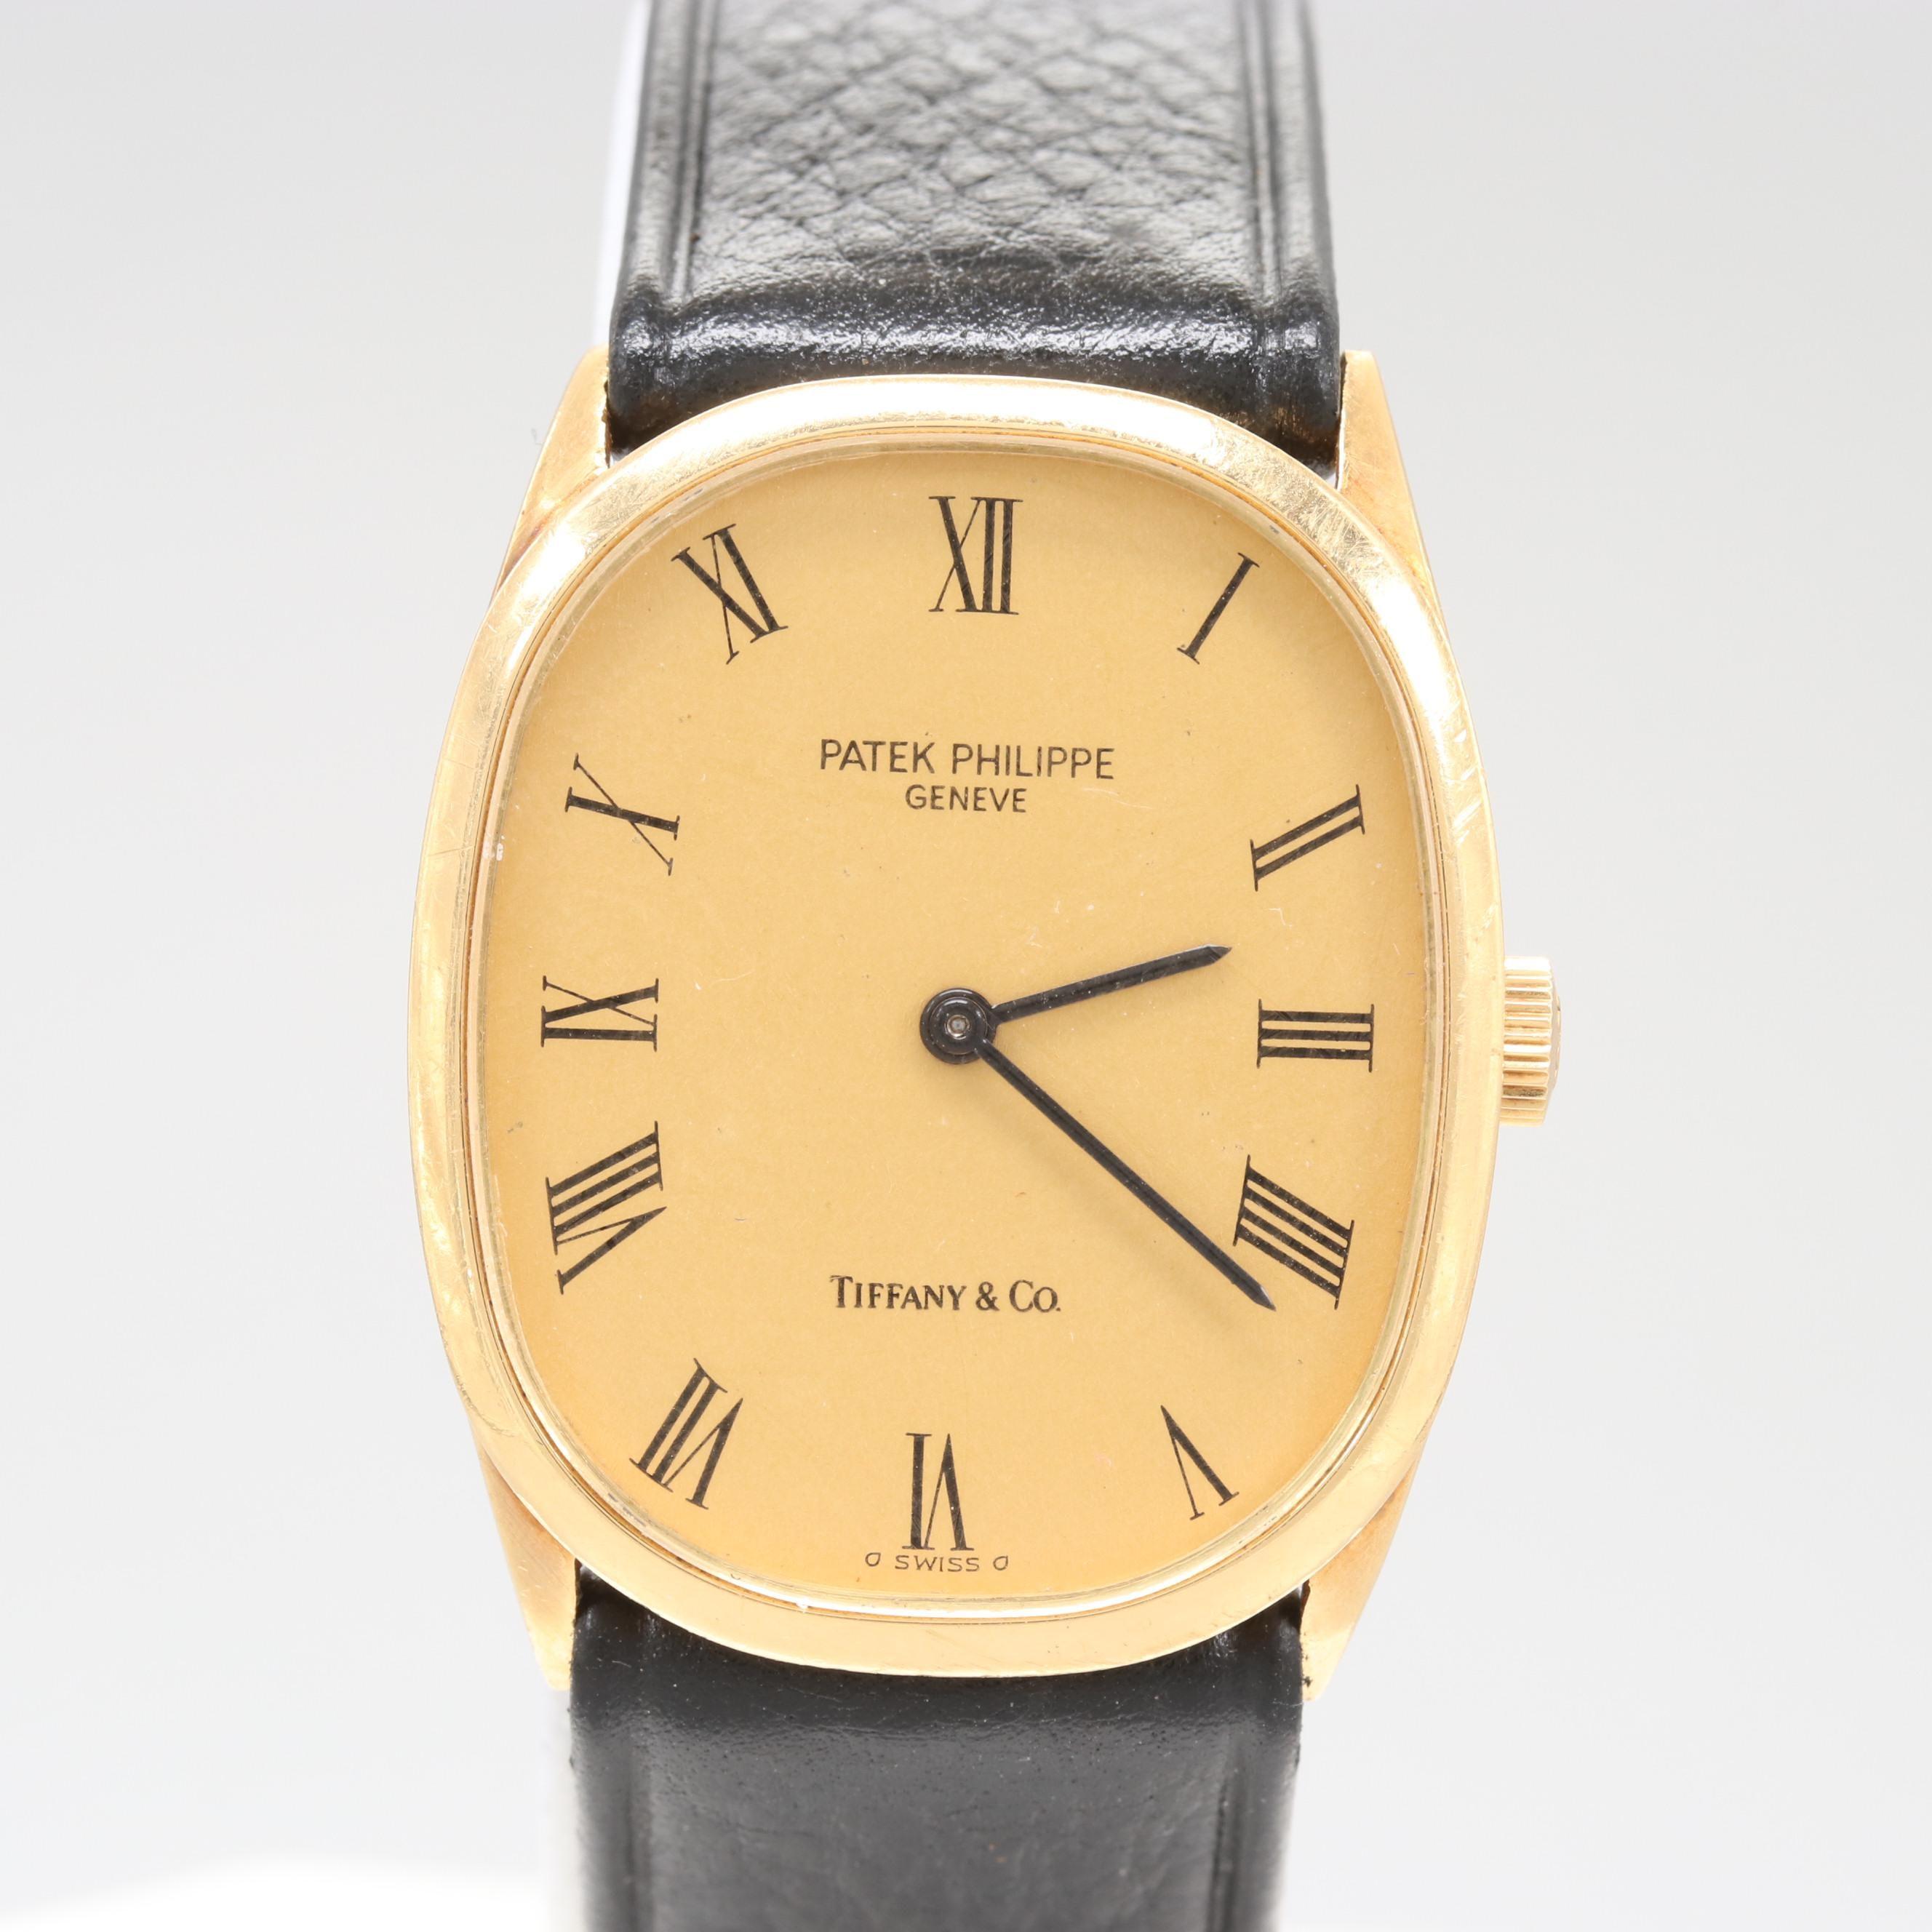 Vintage Patek Philippe for Tiffany & Co. Golden Ellipse Wristwatch